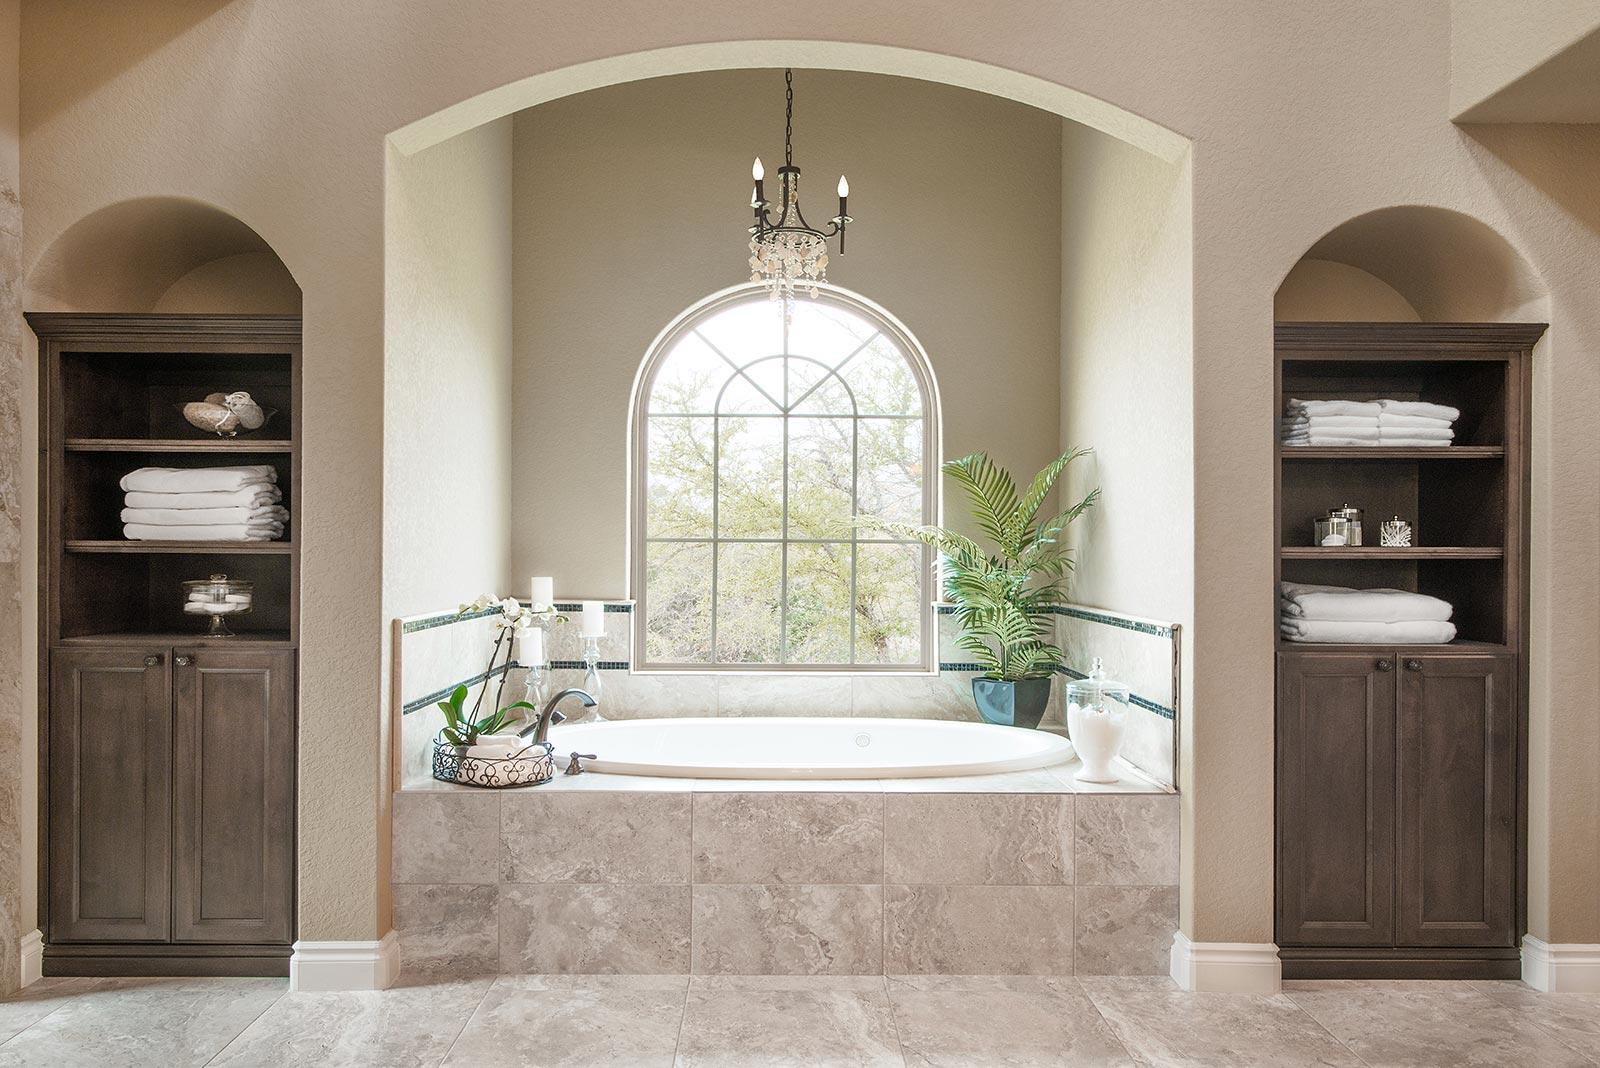 Timeless Classic - Custom Home Builder San Antonio - Robare Custom Homes